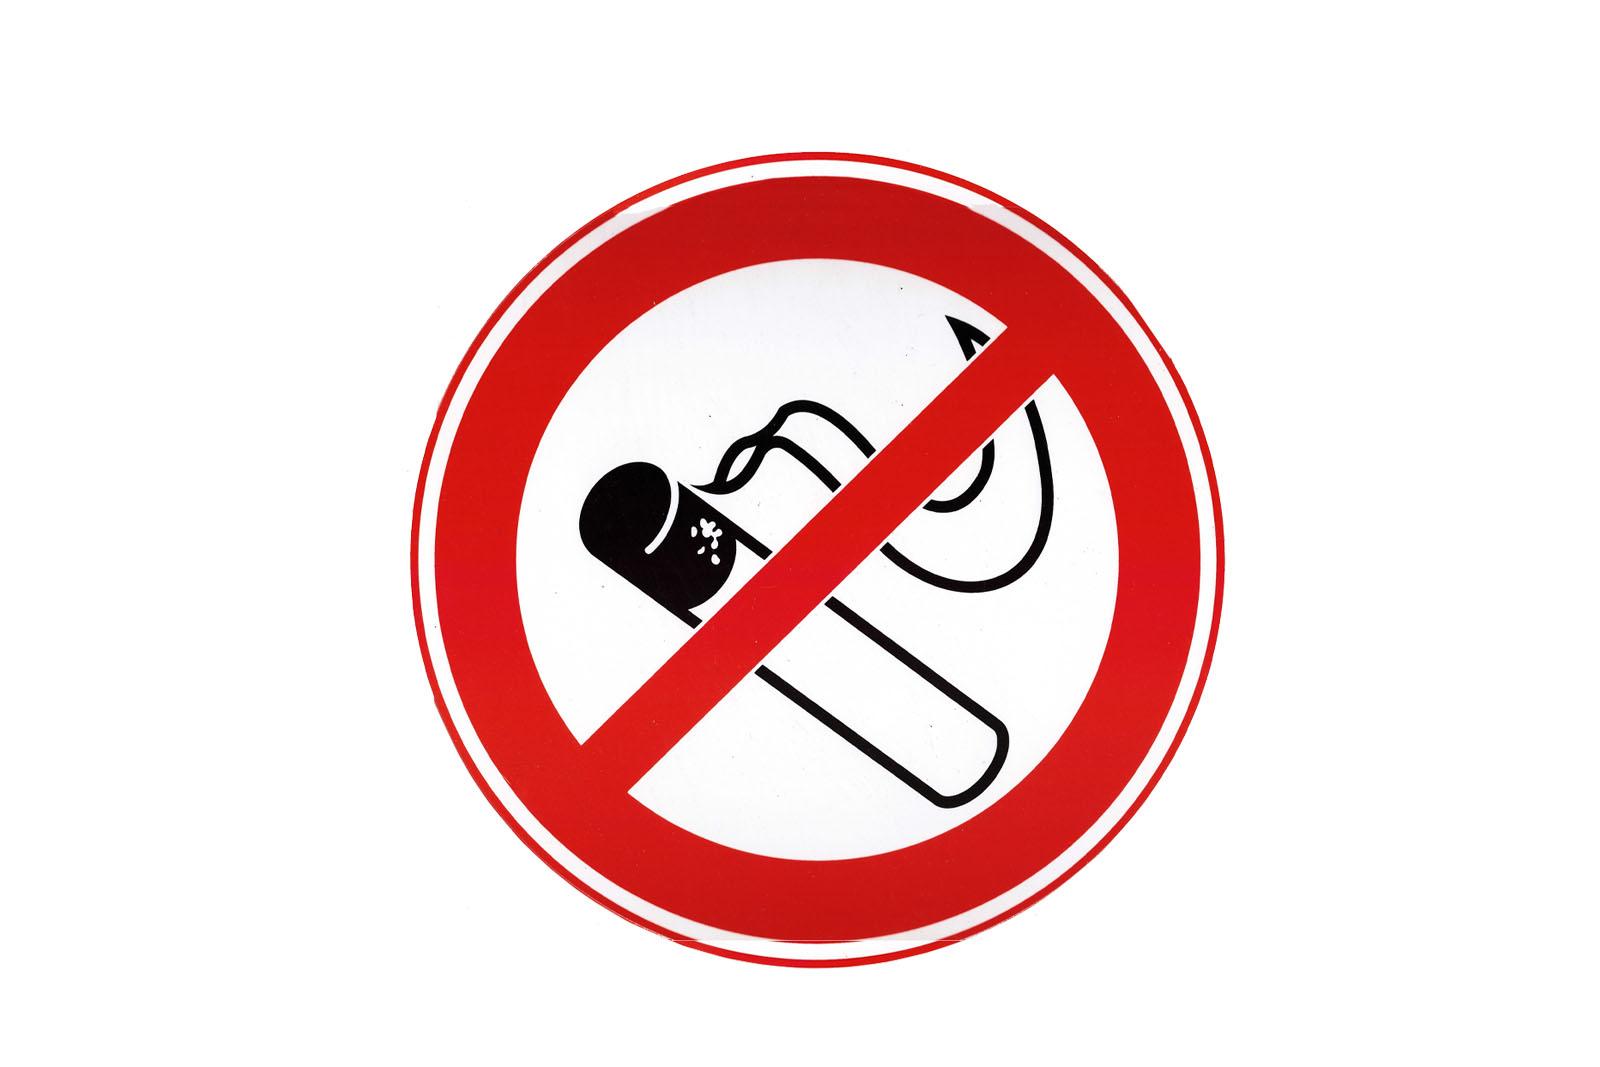 Знак запрещающий курение картинка